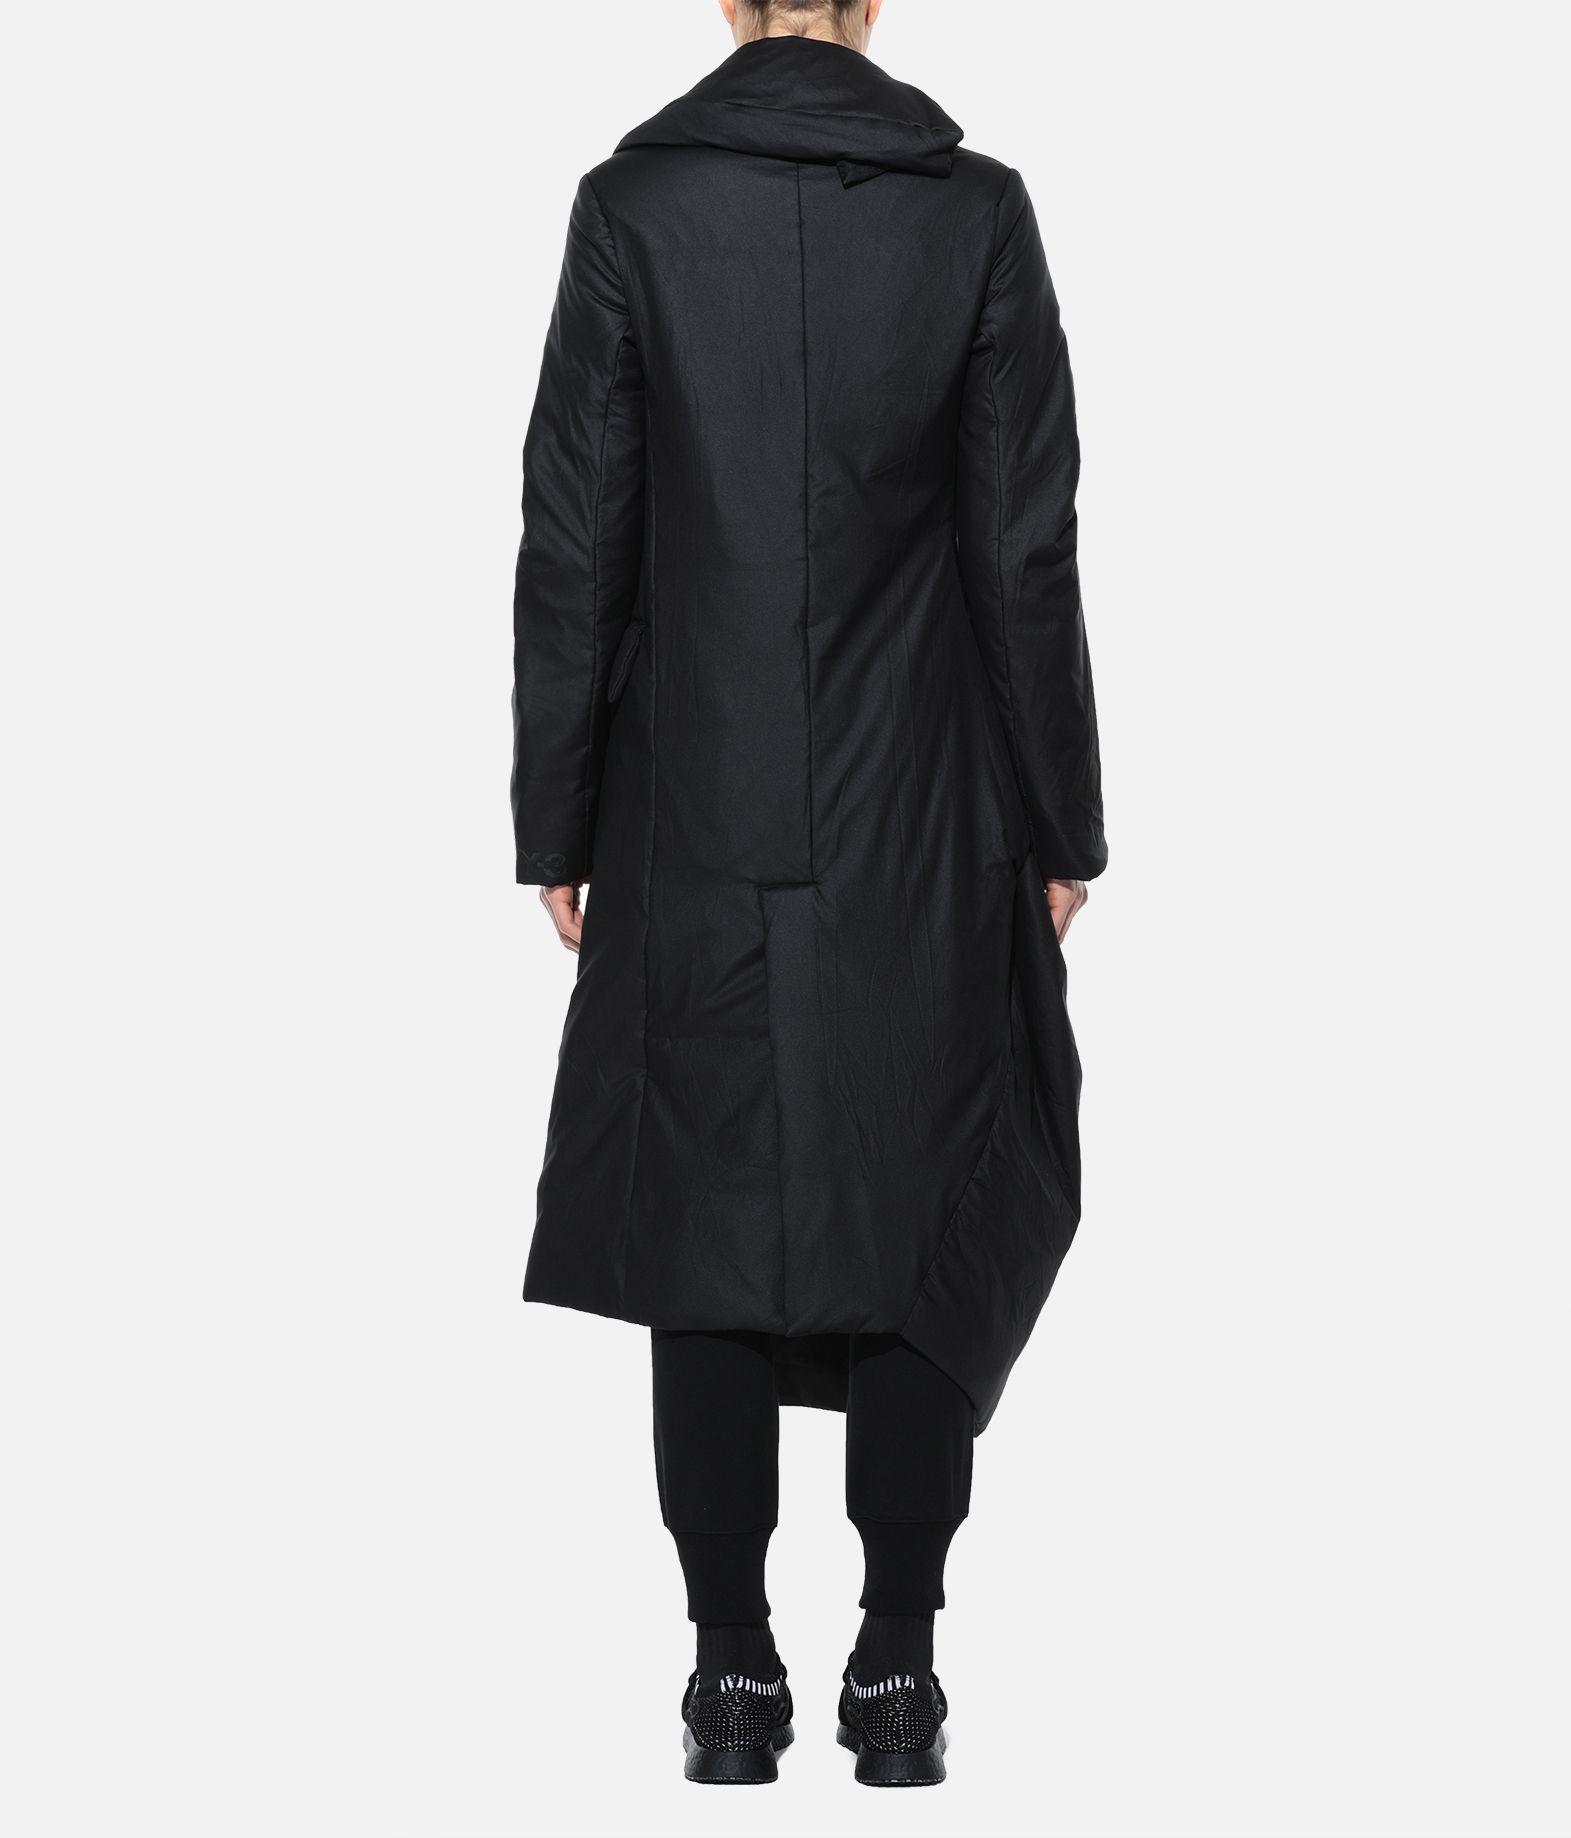 Y-3 Y-3 Adizero Padded Coat Куртка Для Женщин d